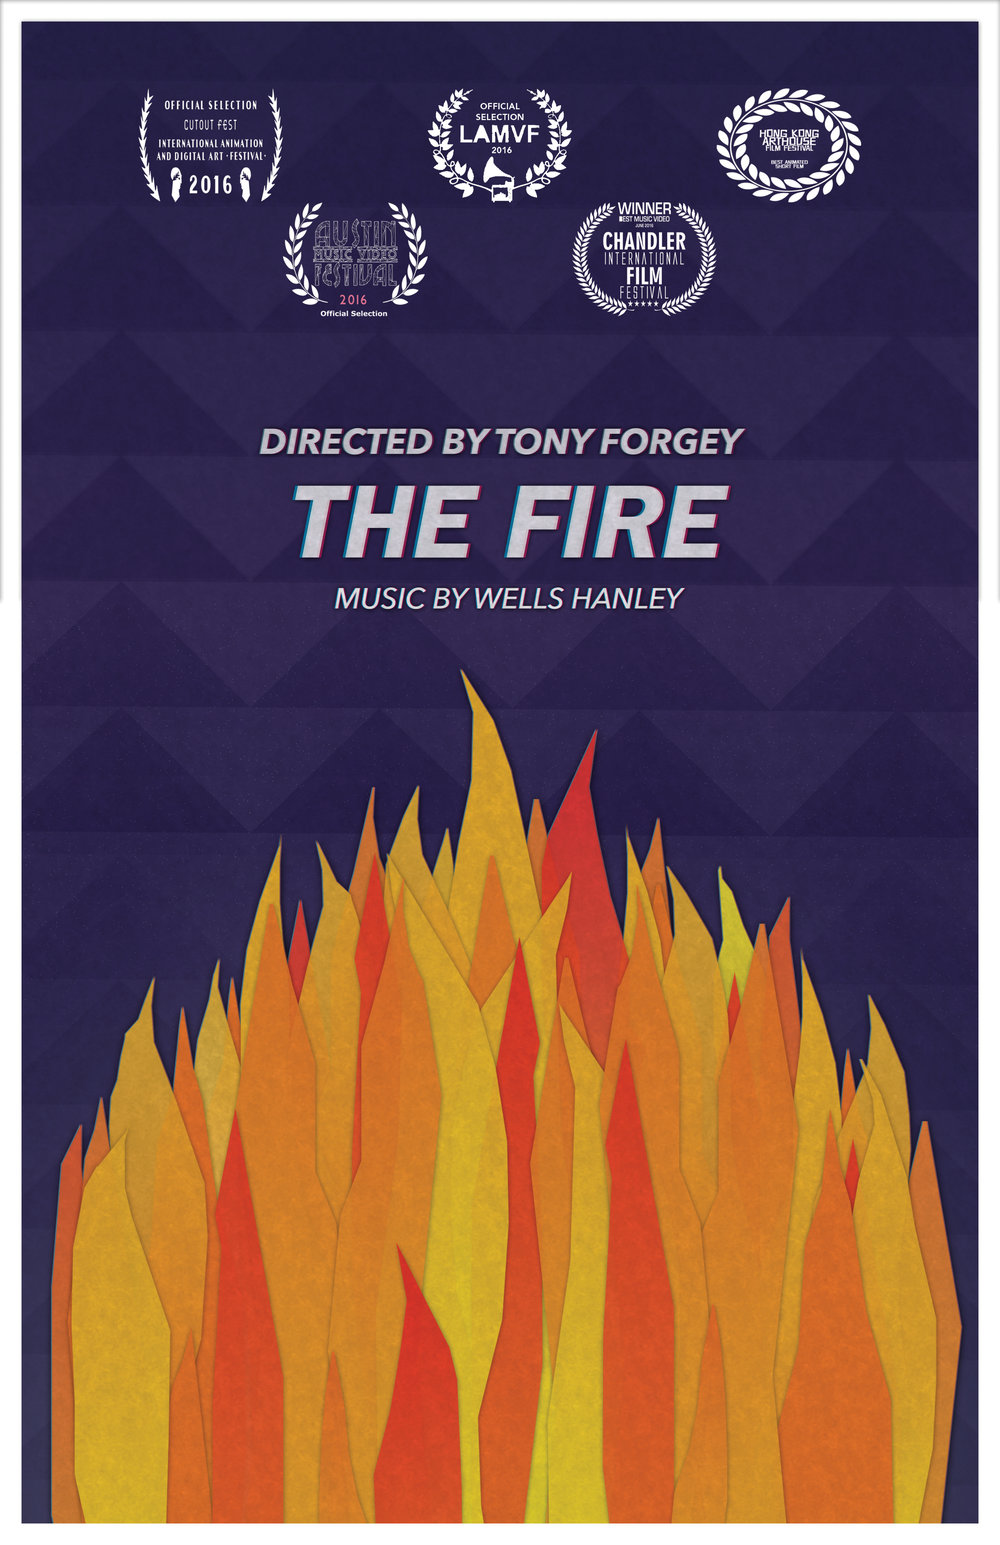 The-Fire-poster-Jan2017.jpg